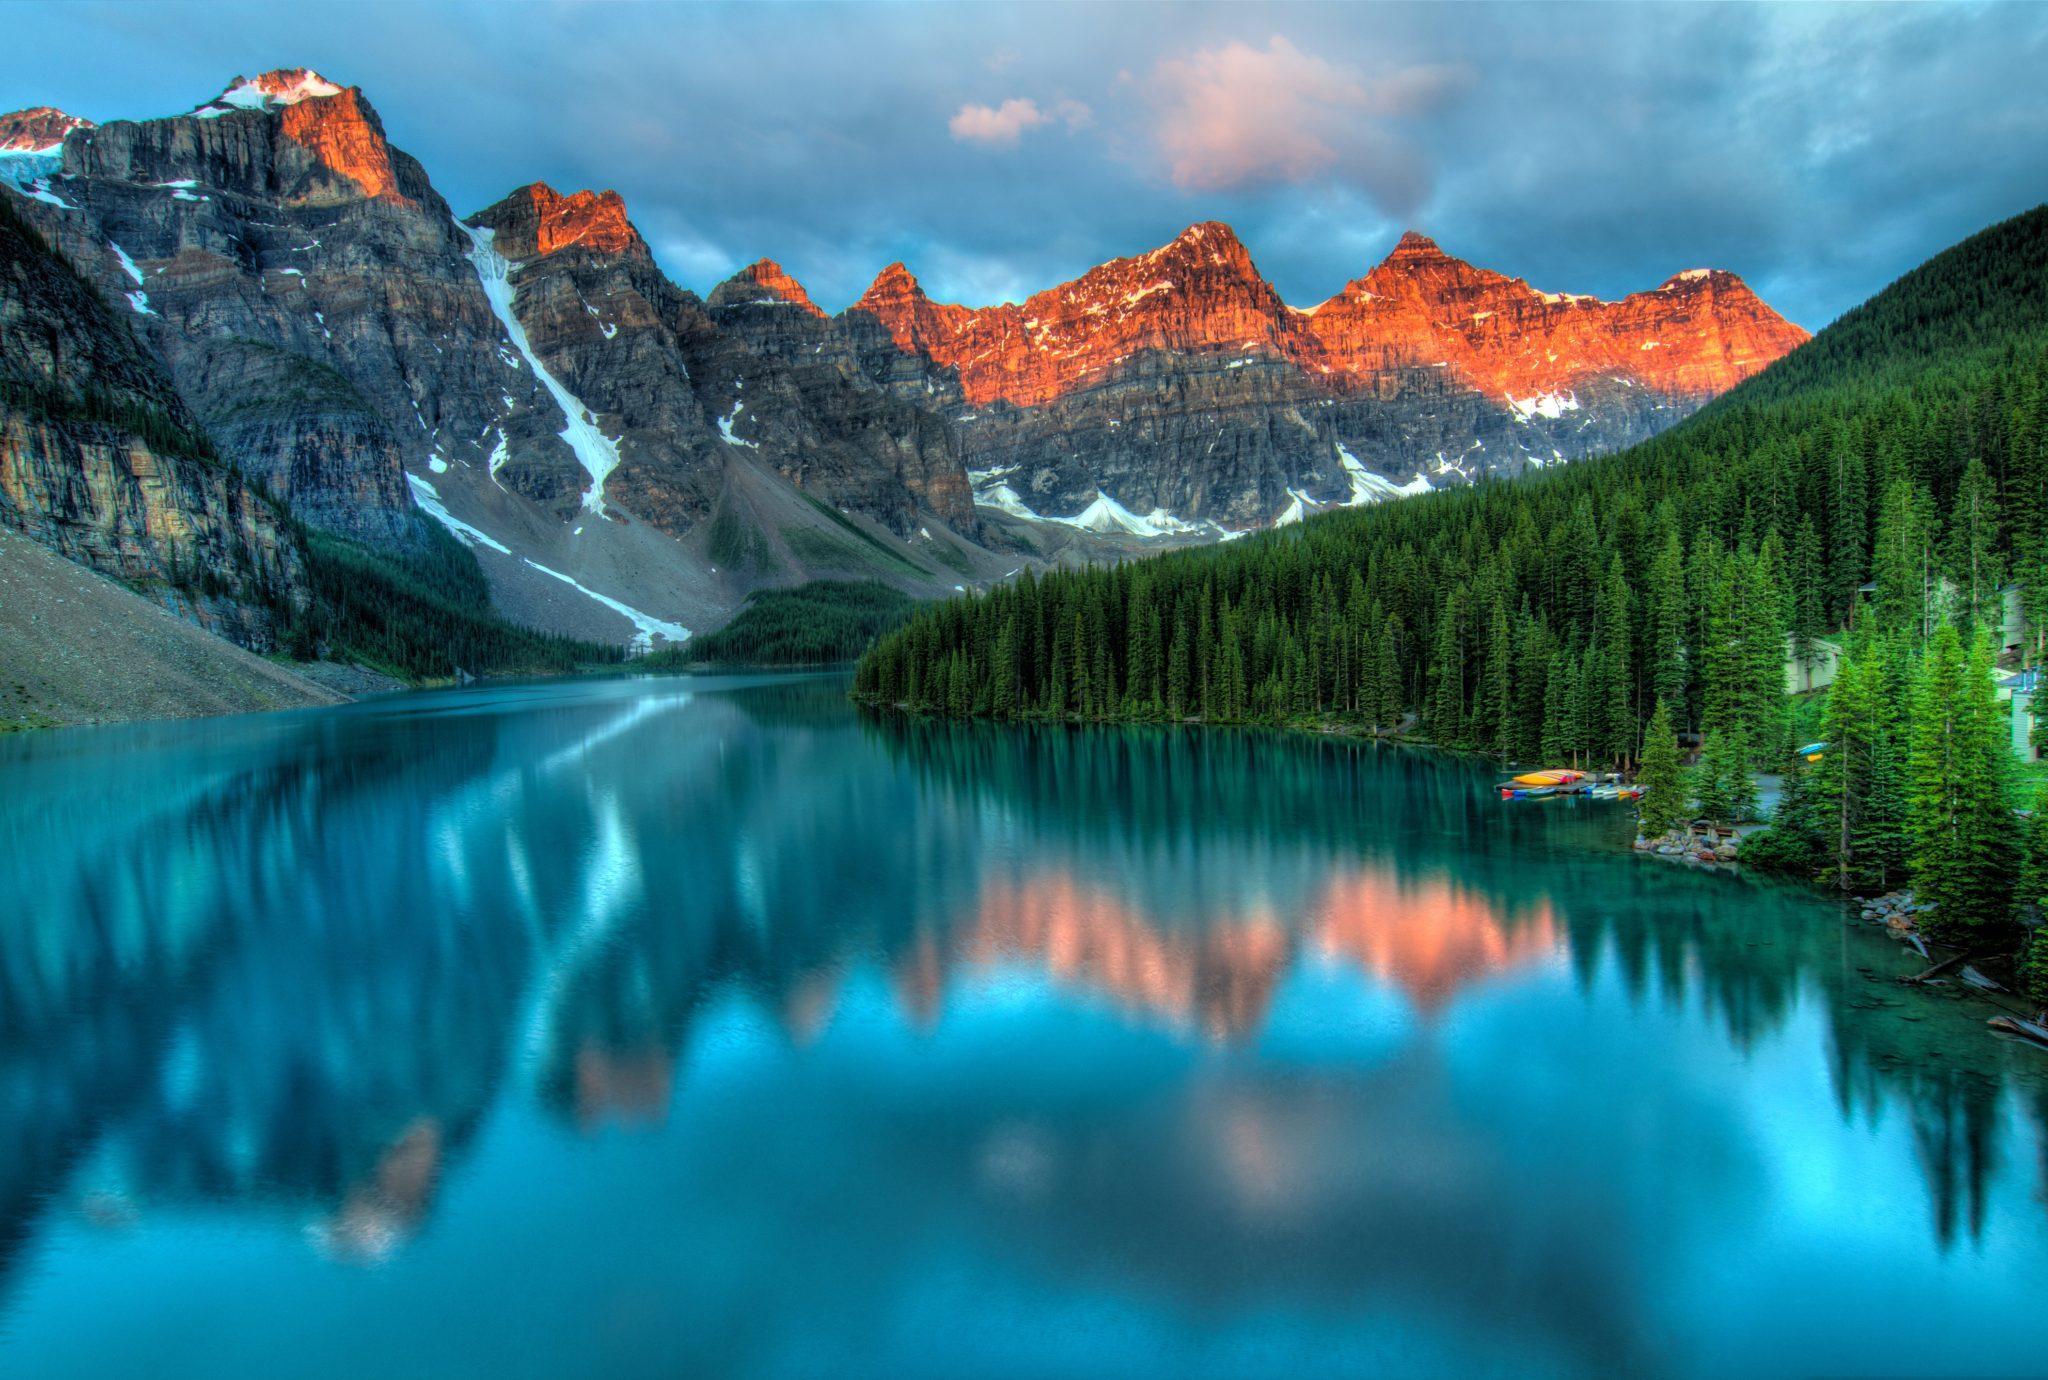 Kanada jezioro Moraine